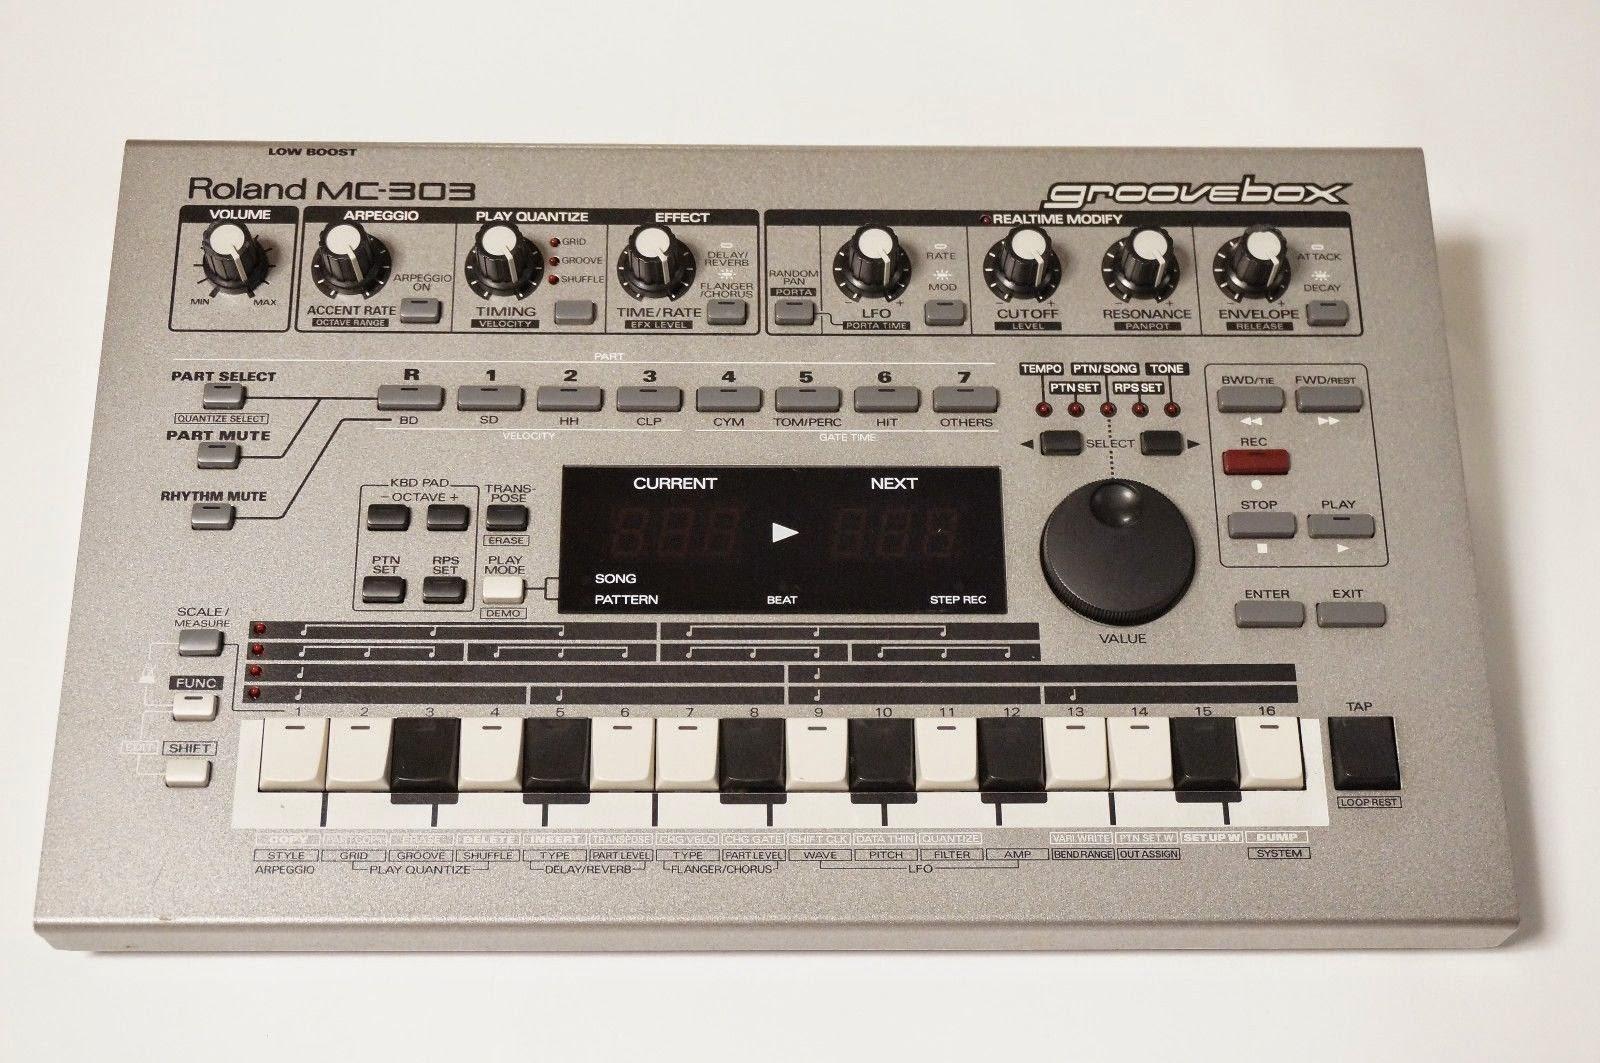 jondent exploring electronic music roland drum machines the timeline. Black Bedroom Furniture Sets. Home Design Ideas